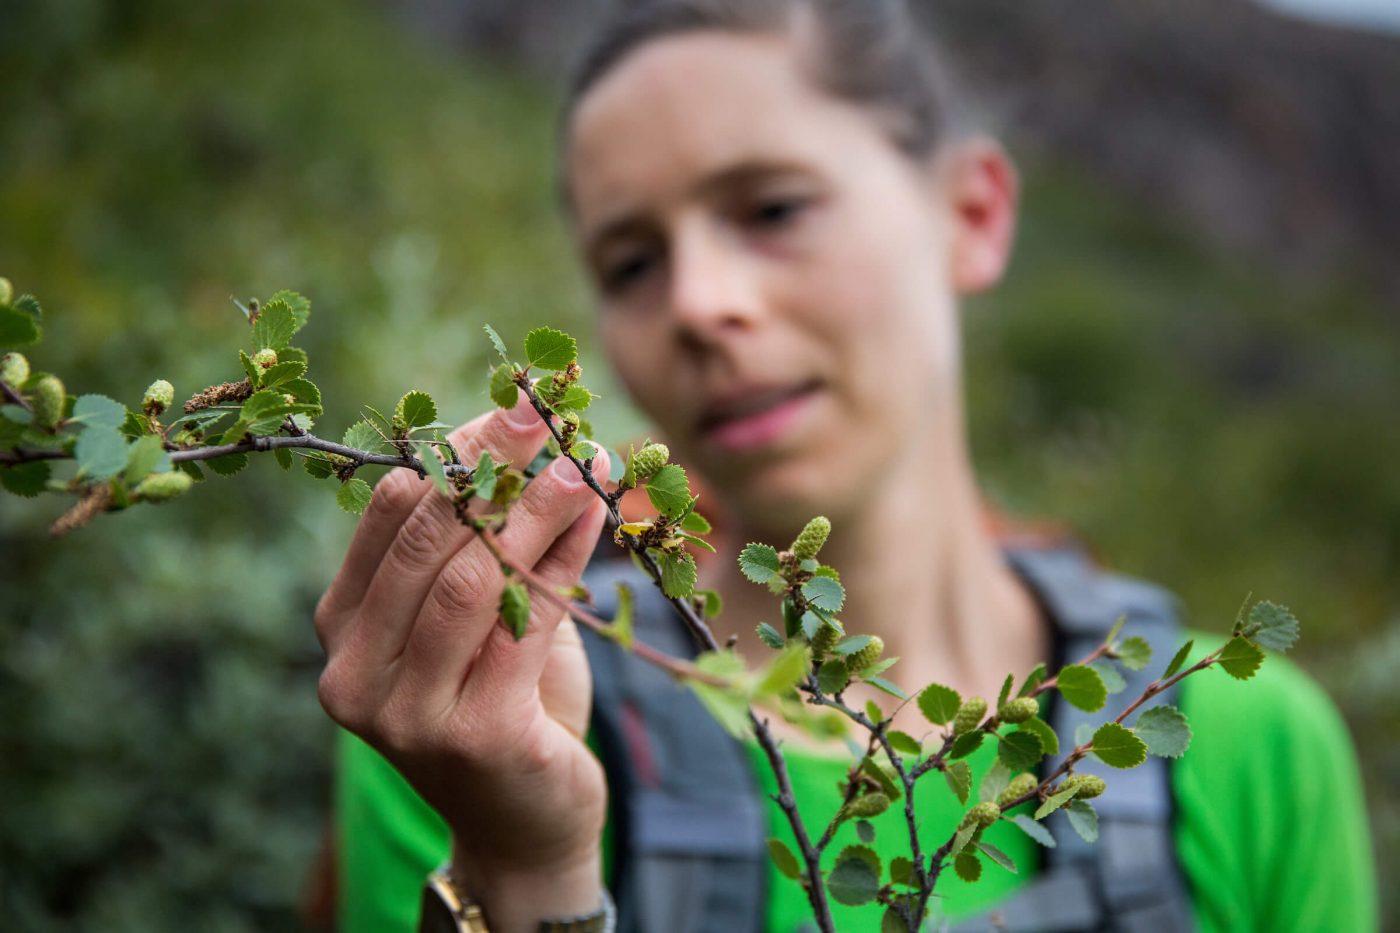 Hiker exploring trees in Narsarsuaq. By Mads Pihl